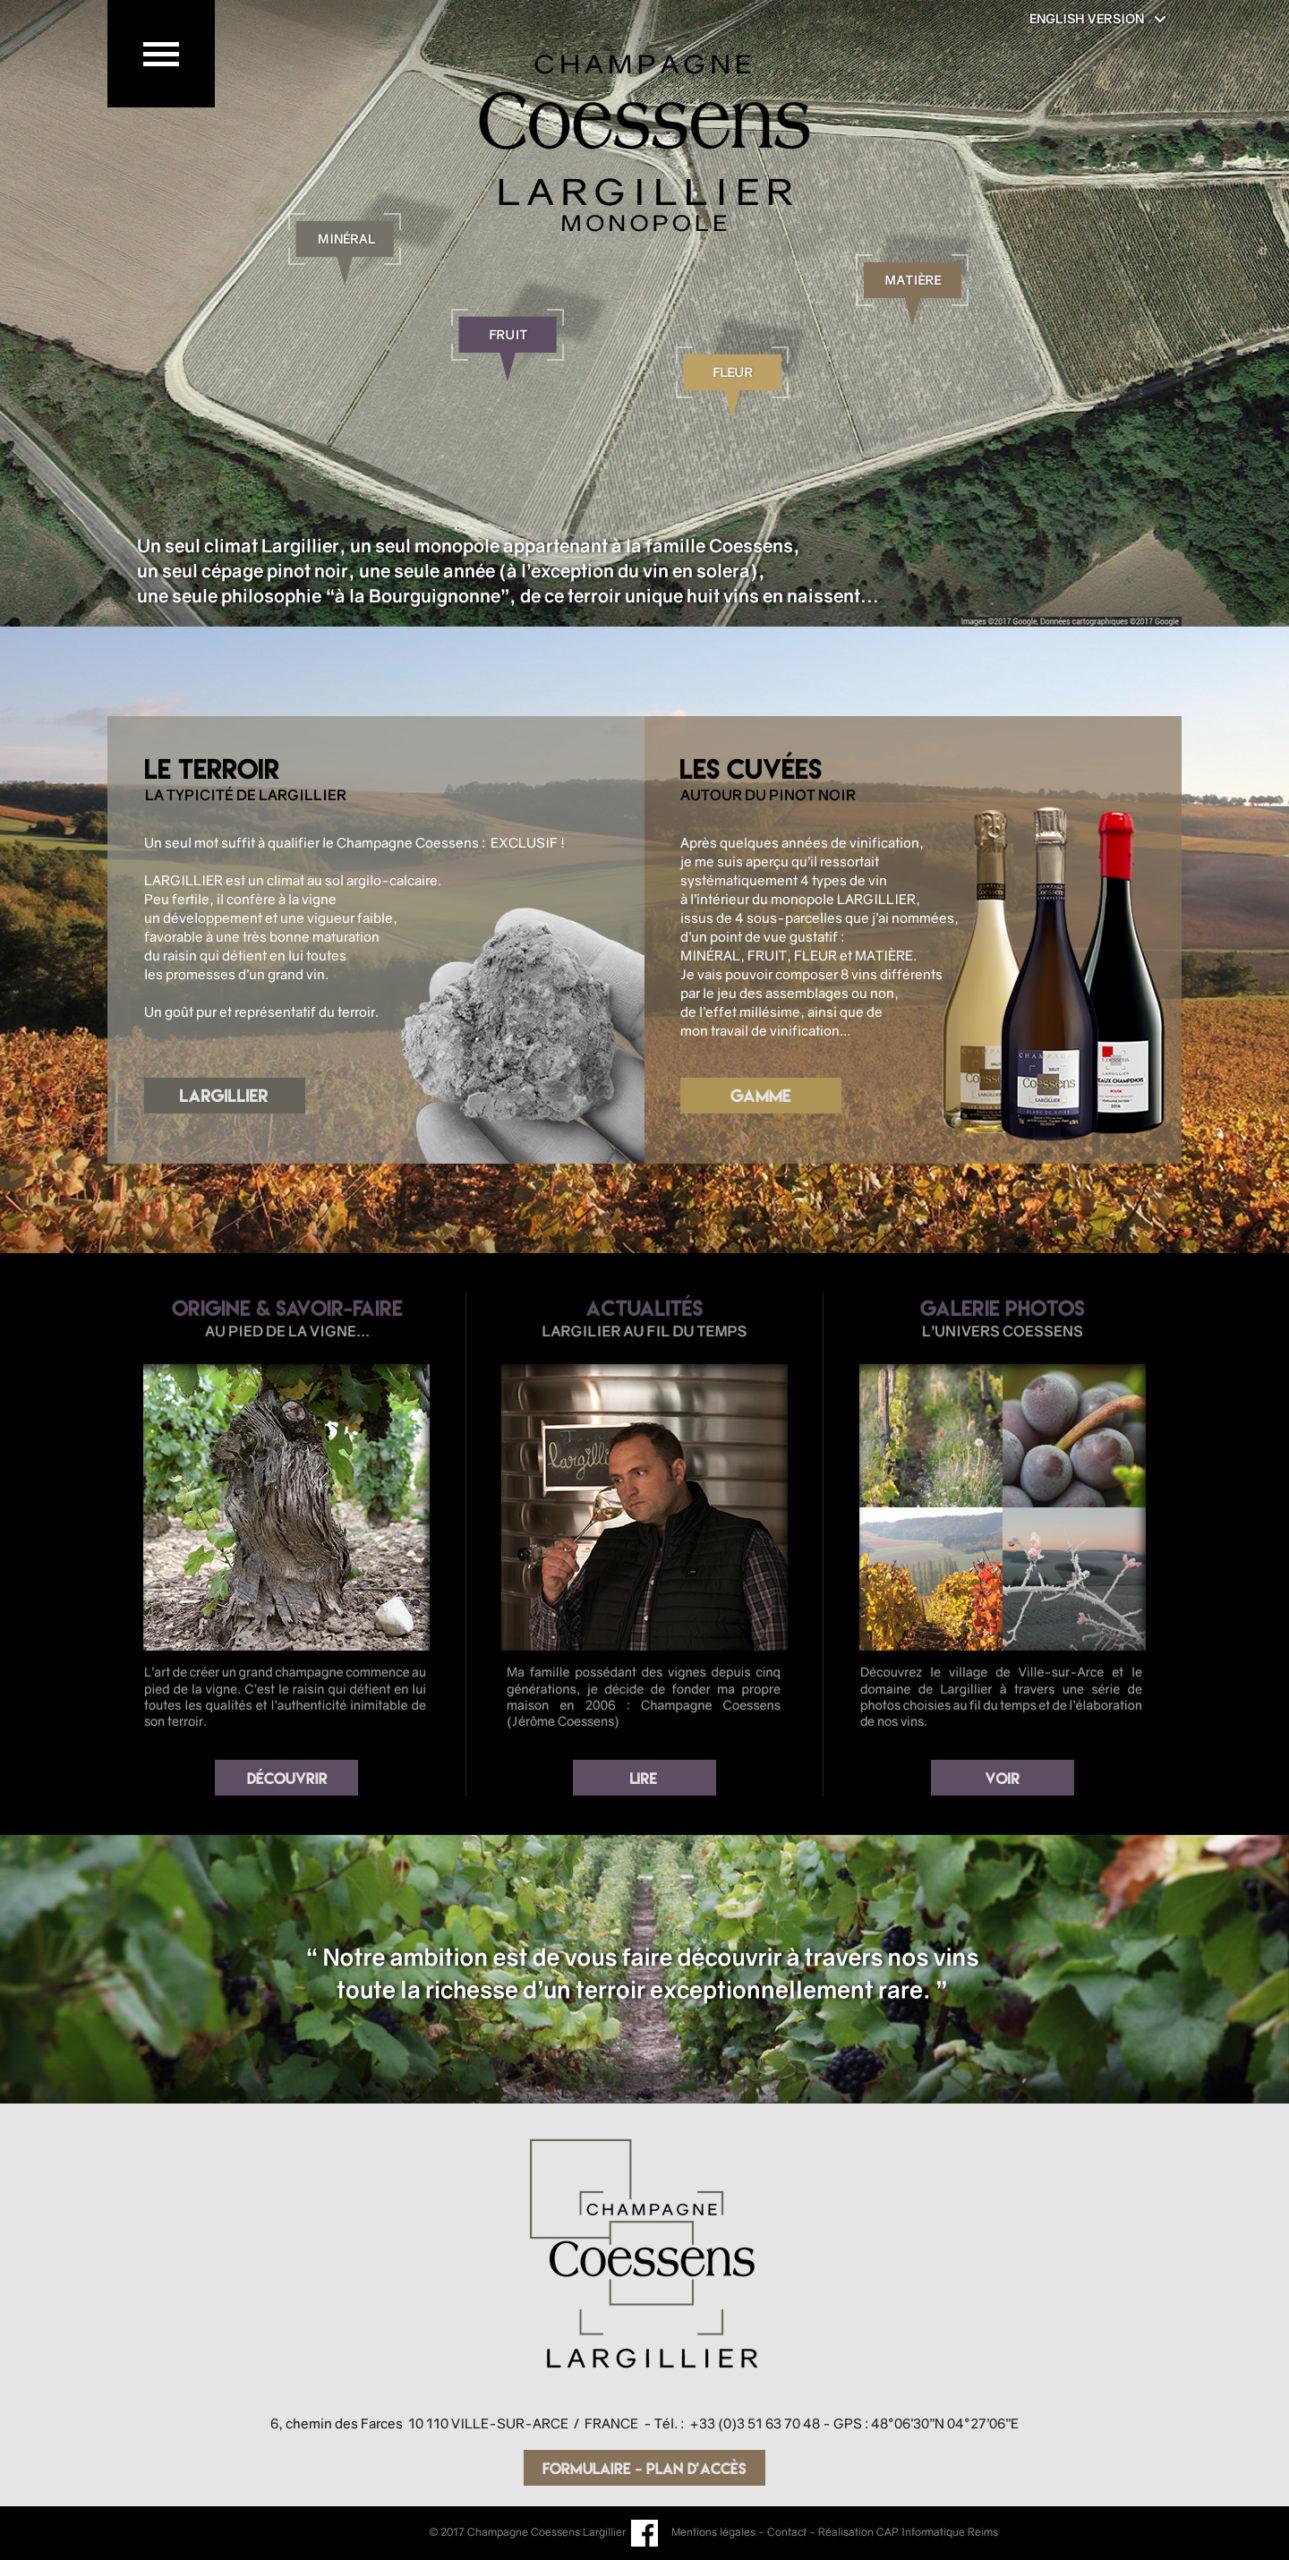 Design du site champagne Coessens